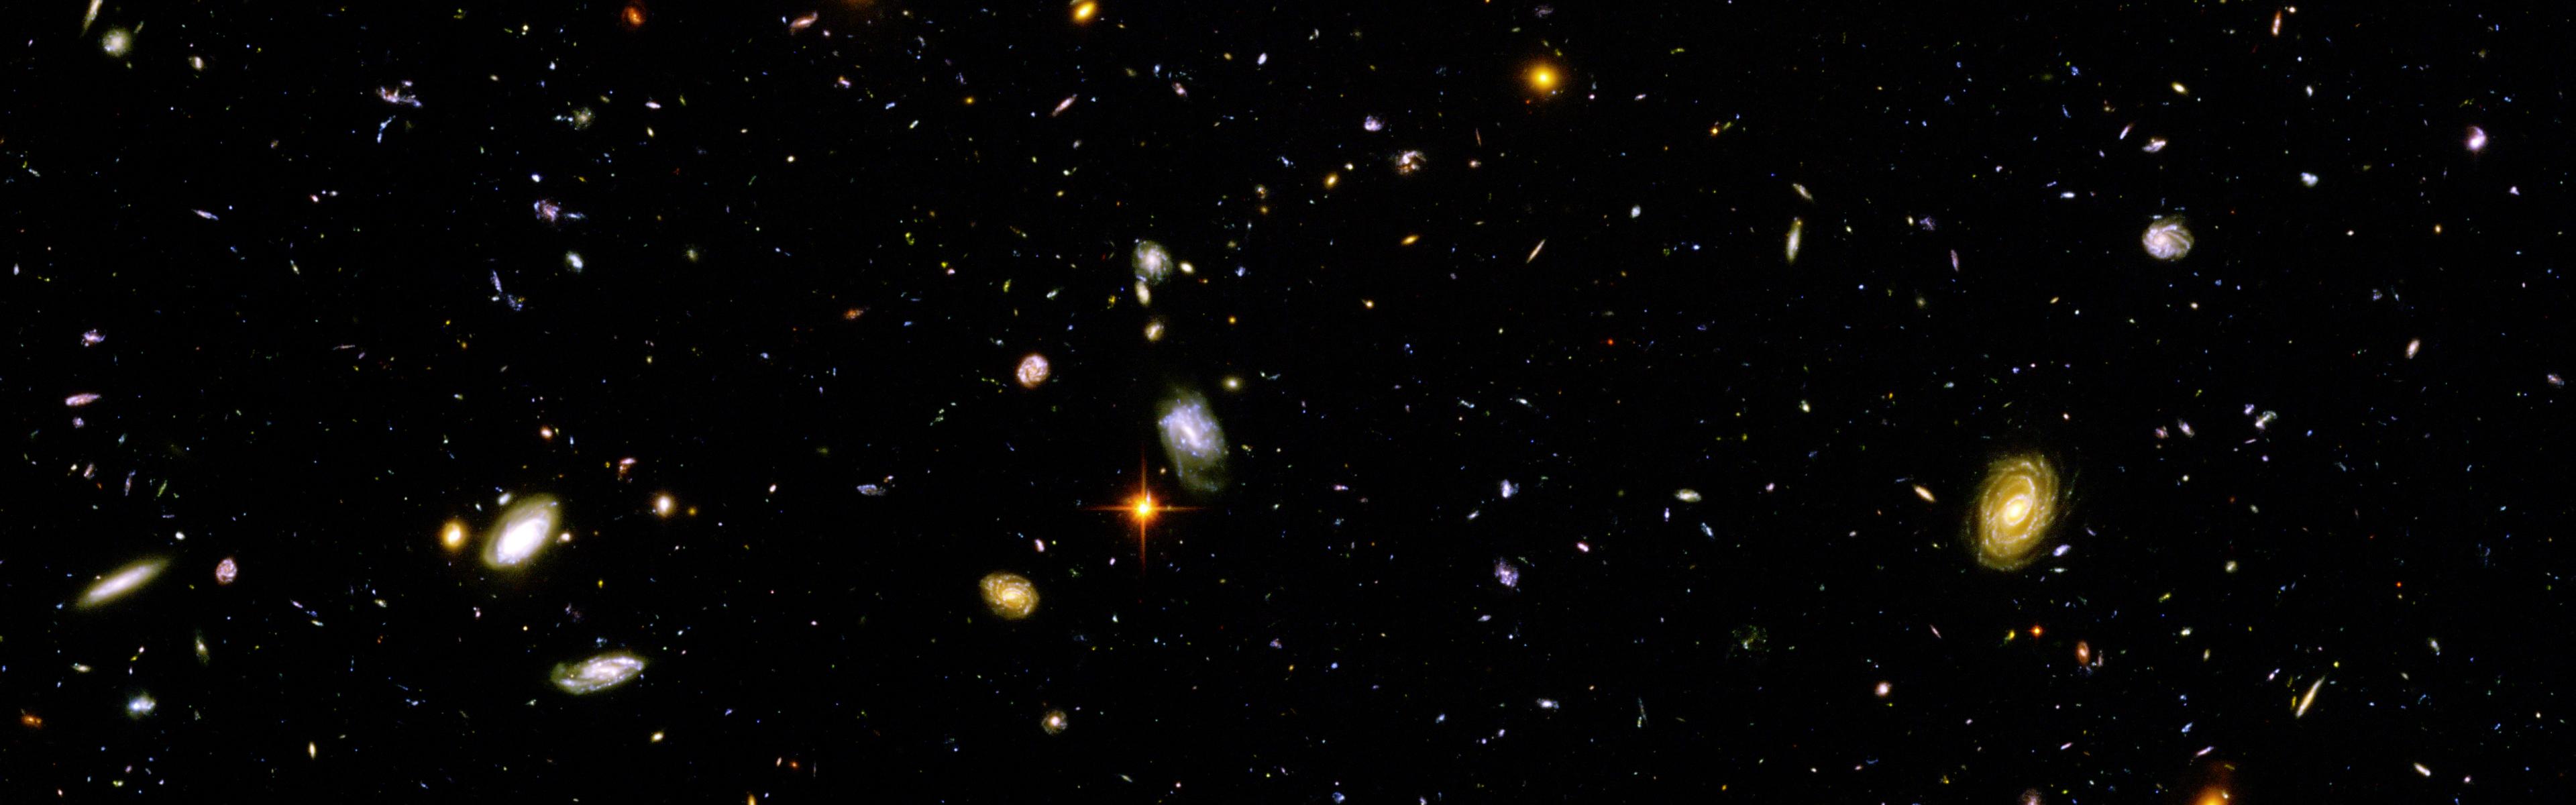 Hubble Ultra Deep Field Dual Monitor Wallpapers Hubble 3840x1200